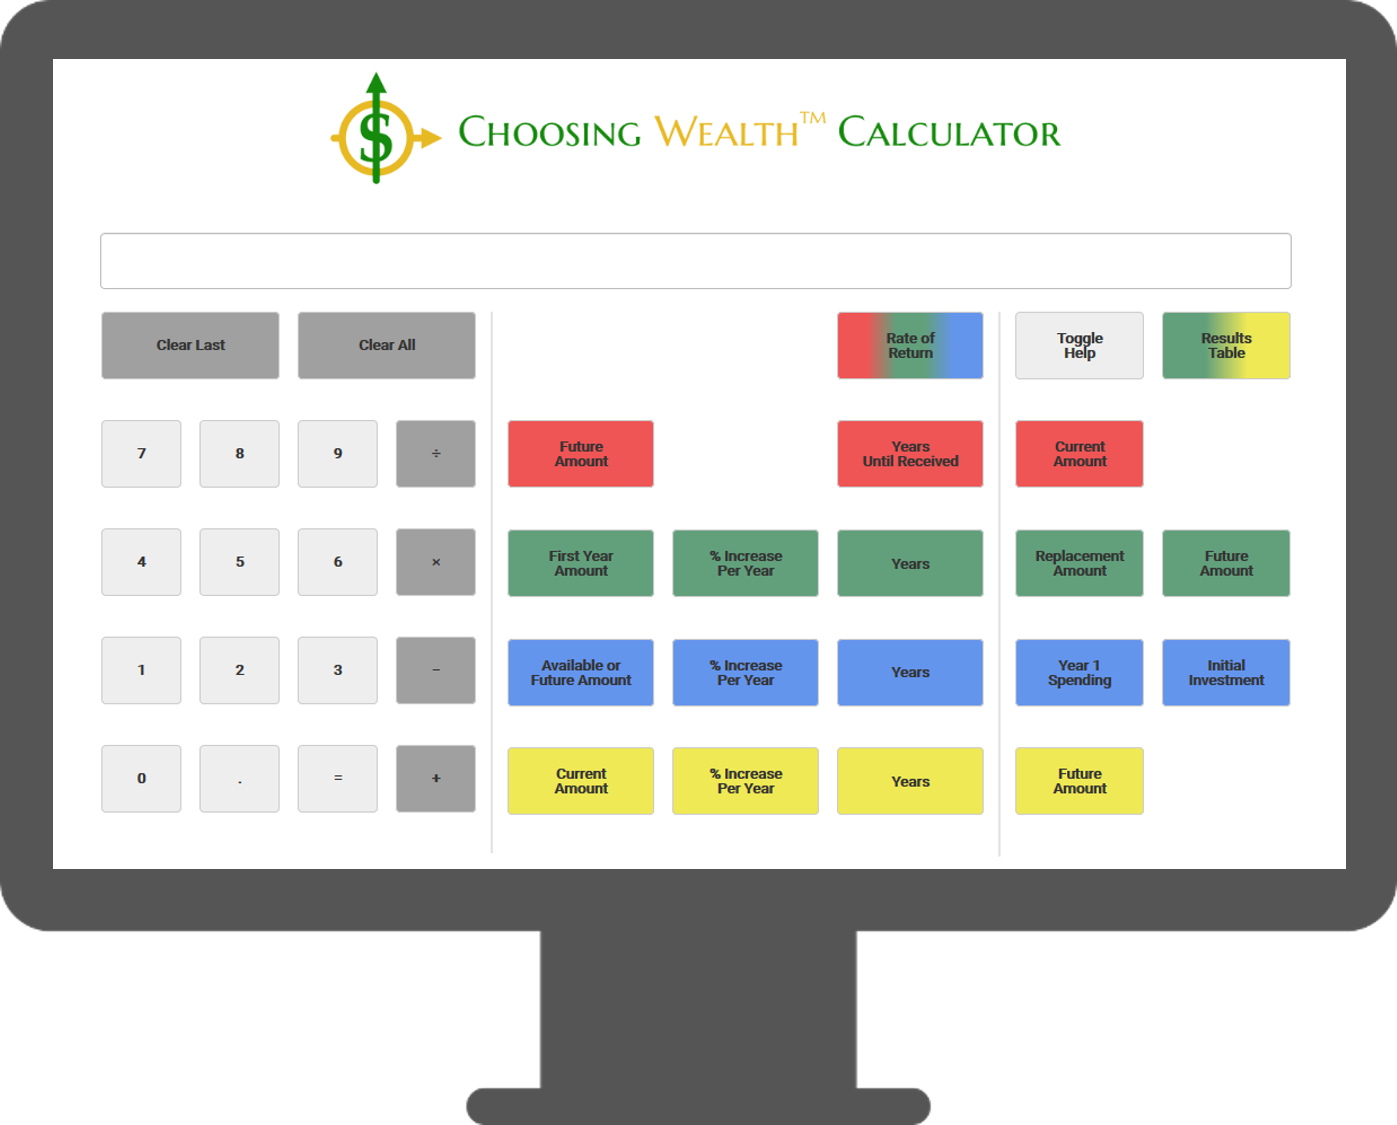 Image of the Choosing Wealth™ Calculator screen simulation